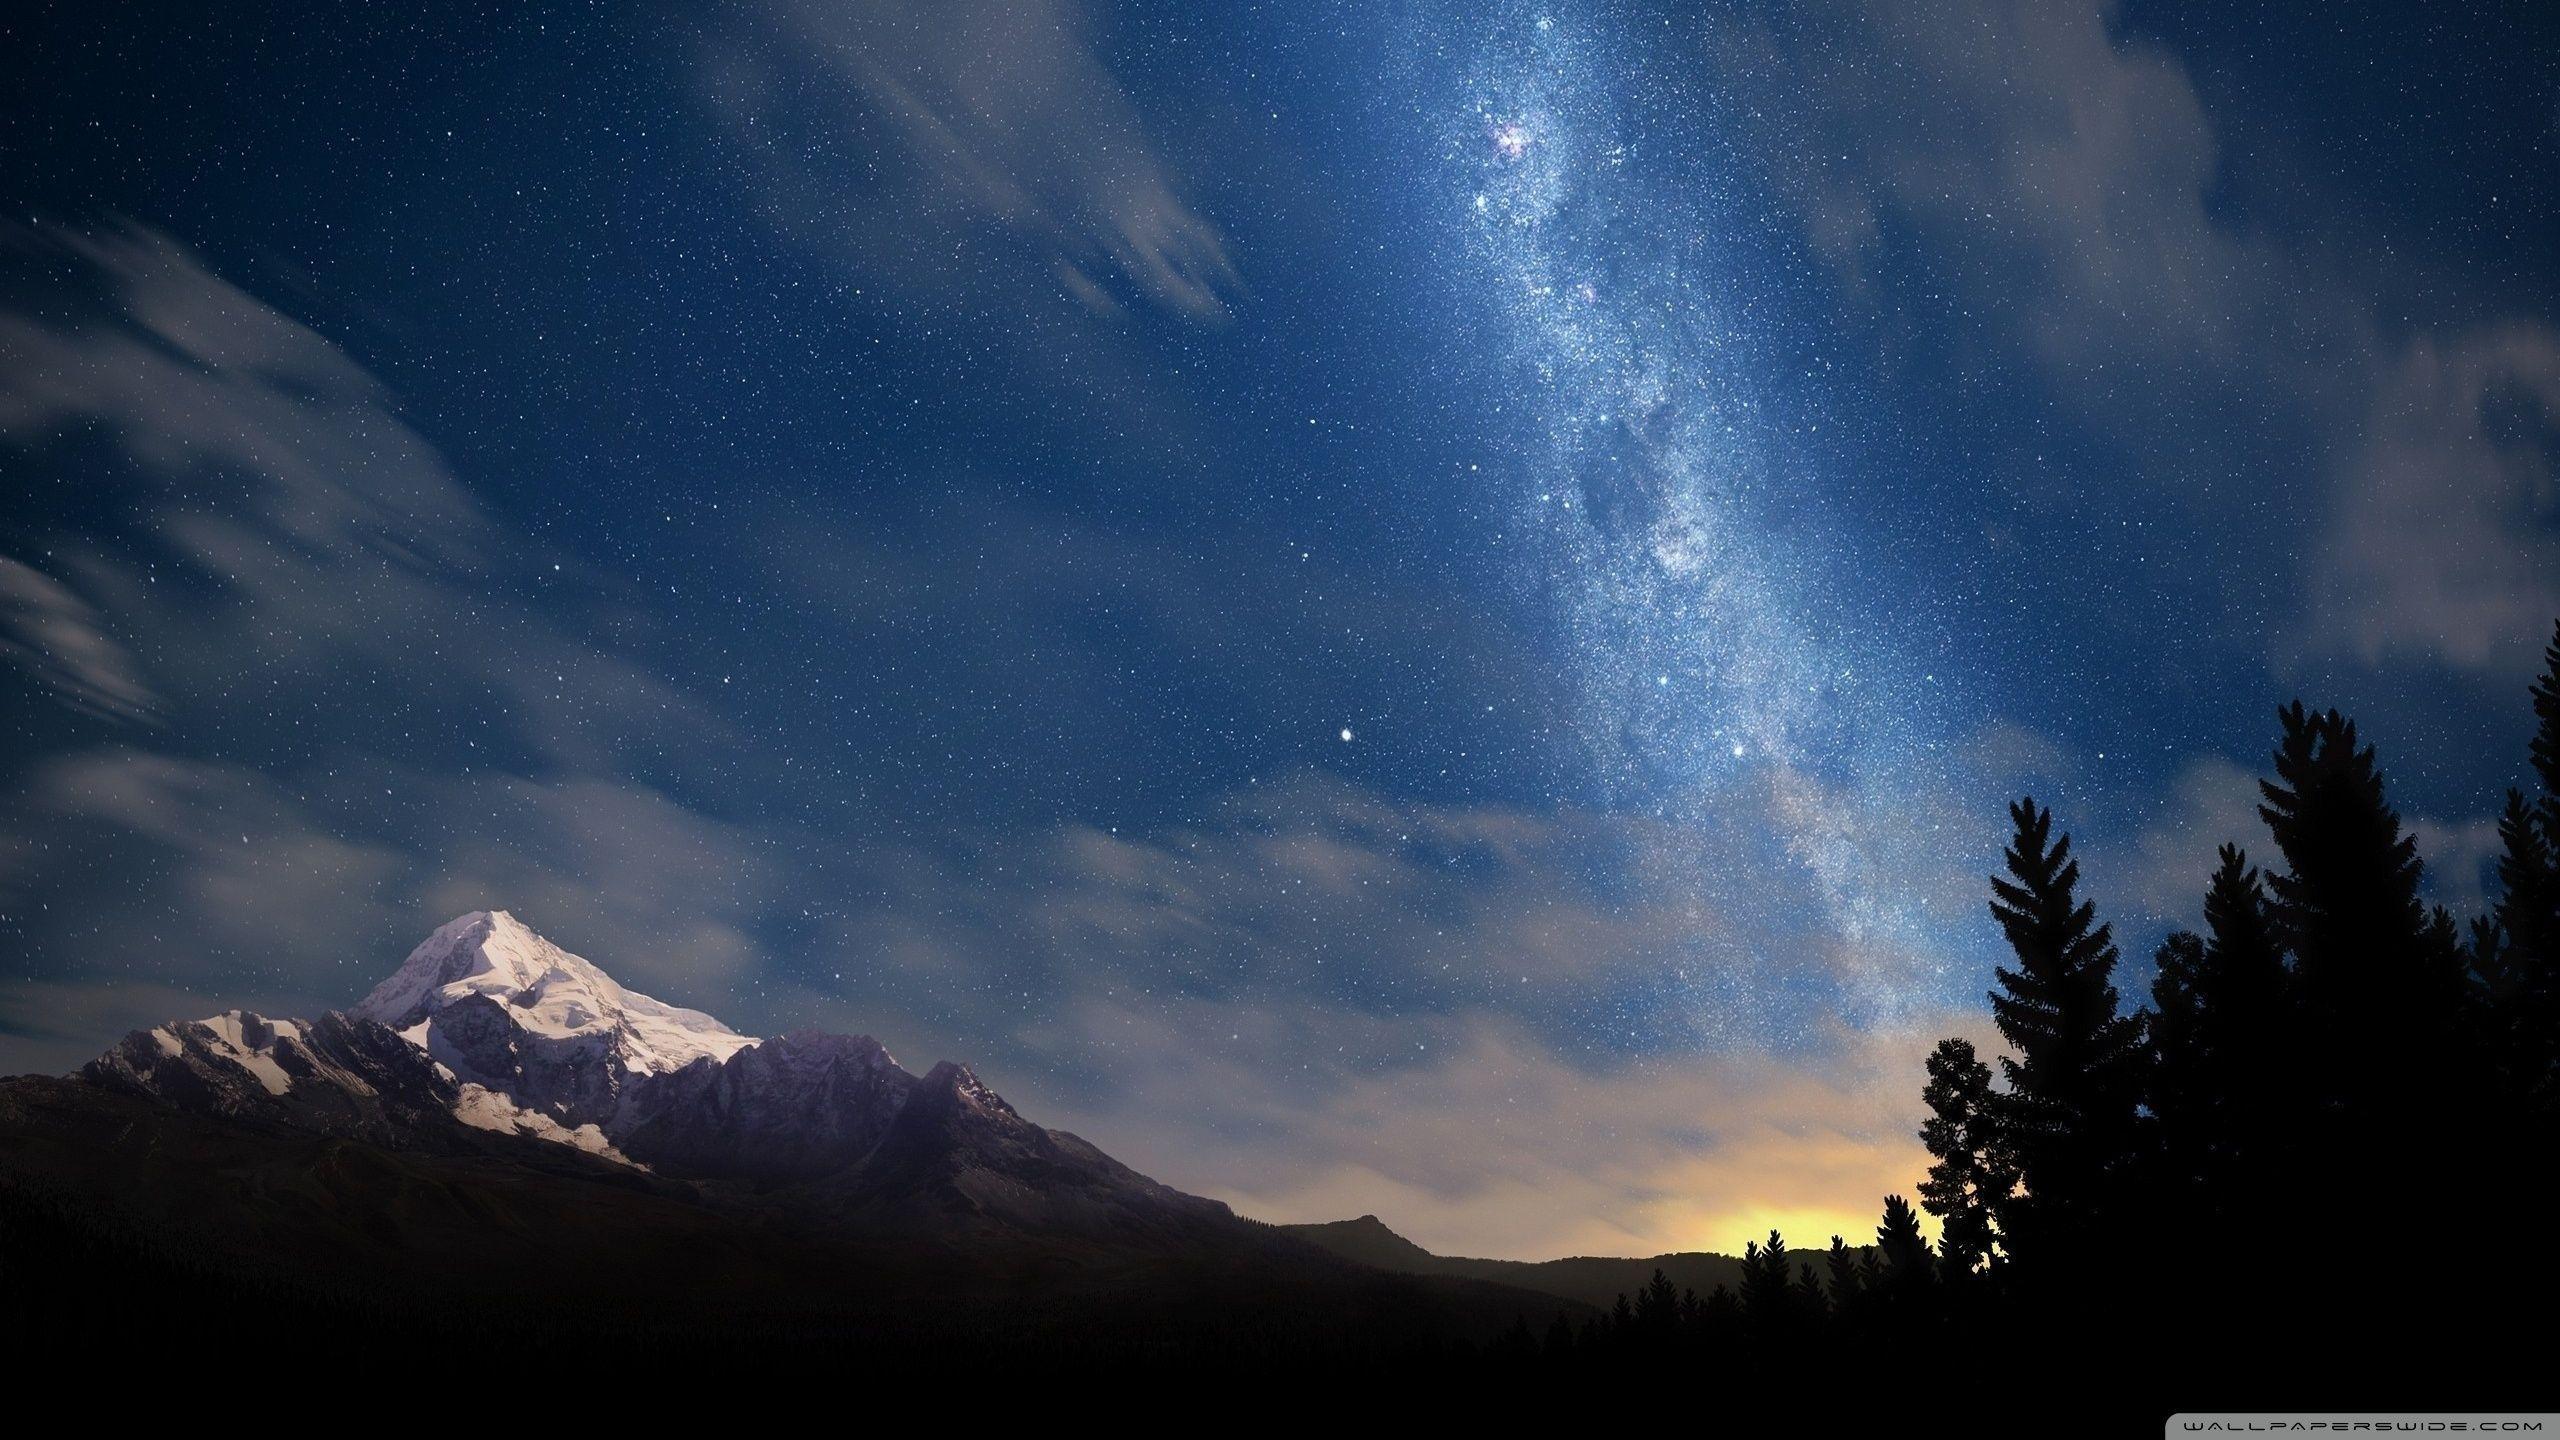 Sky Desktop Wallpapers Top Free Sky Desktop Backgrounds Wallpaperaccess